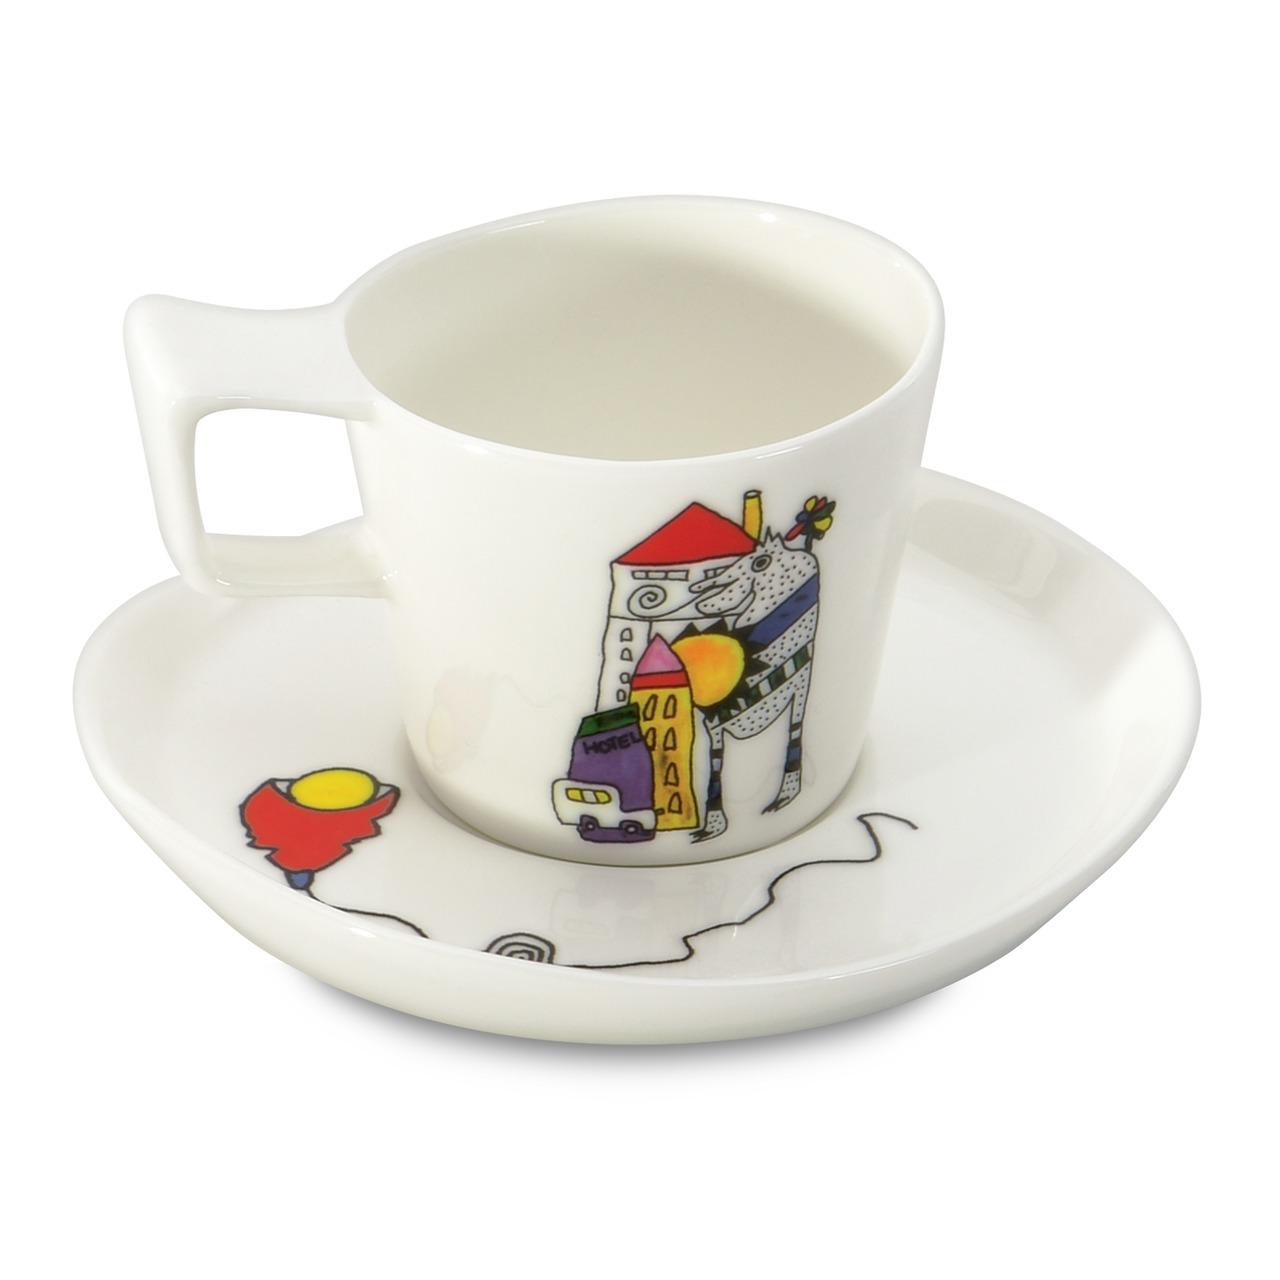 Фото Набор чашек для эспрессо с блюдцем 80 мл BergHOFF Eclipse ornament 2 шт